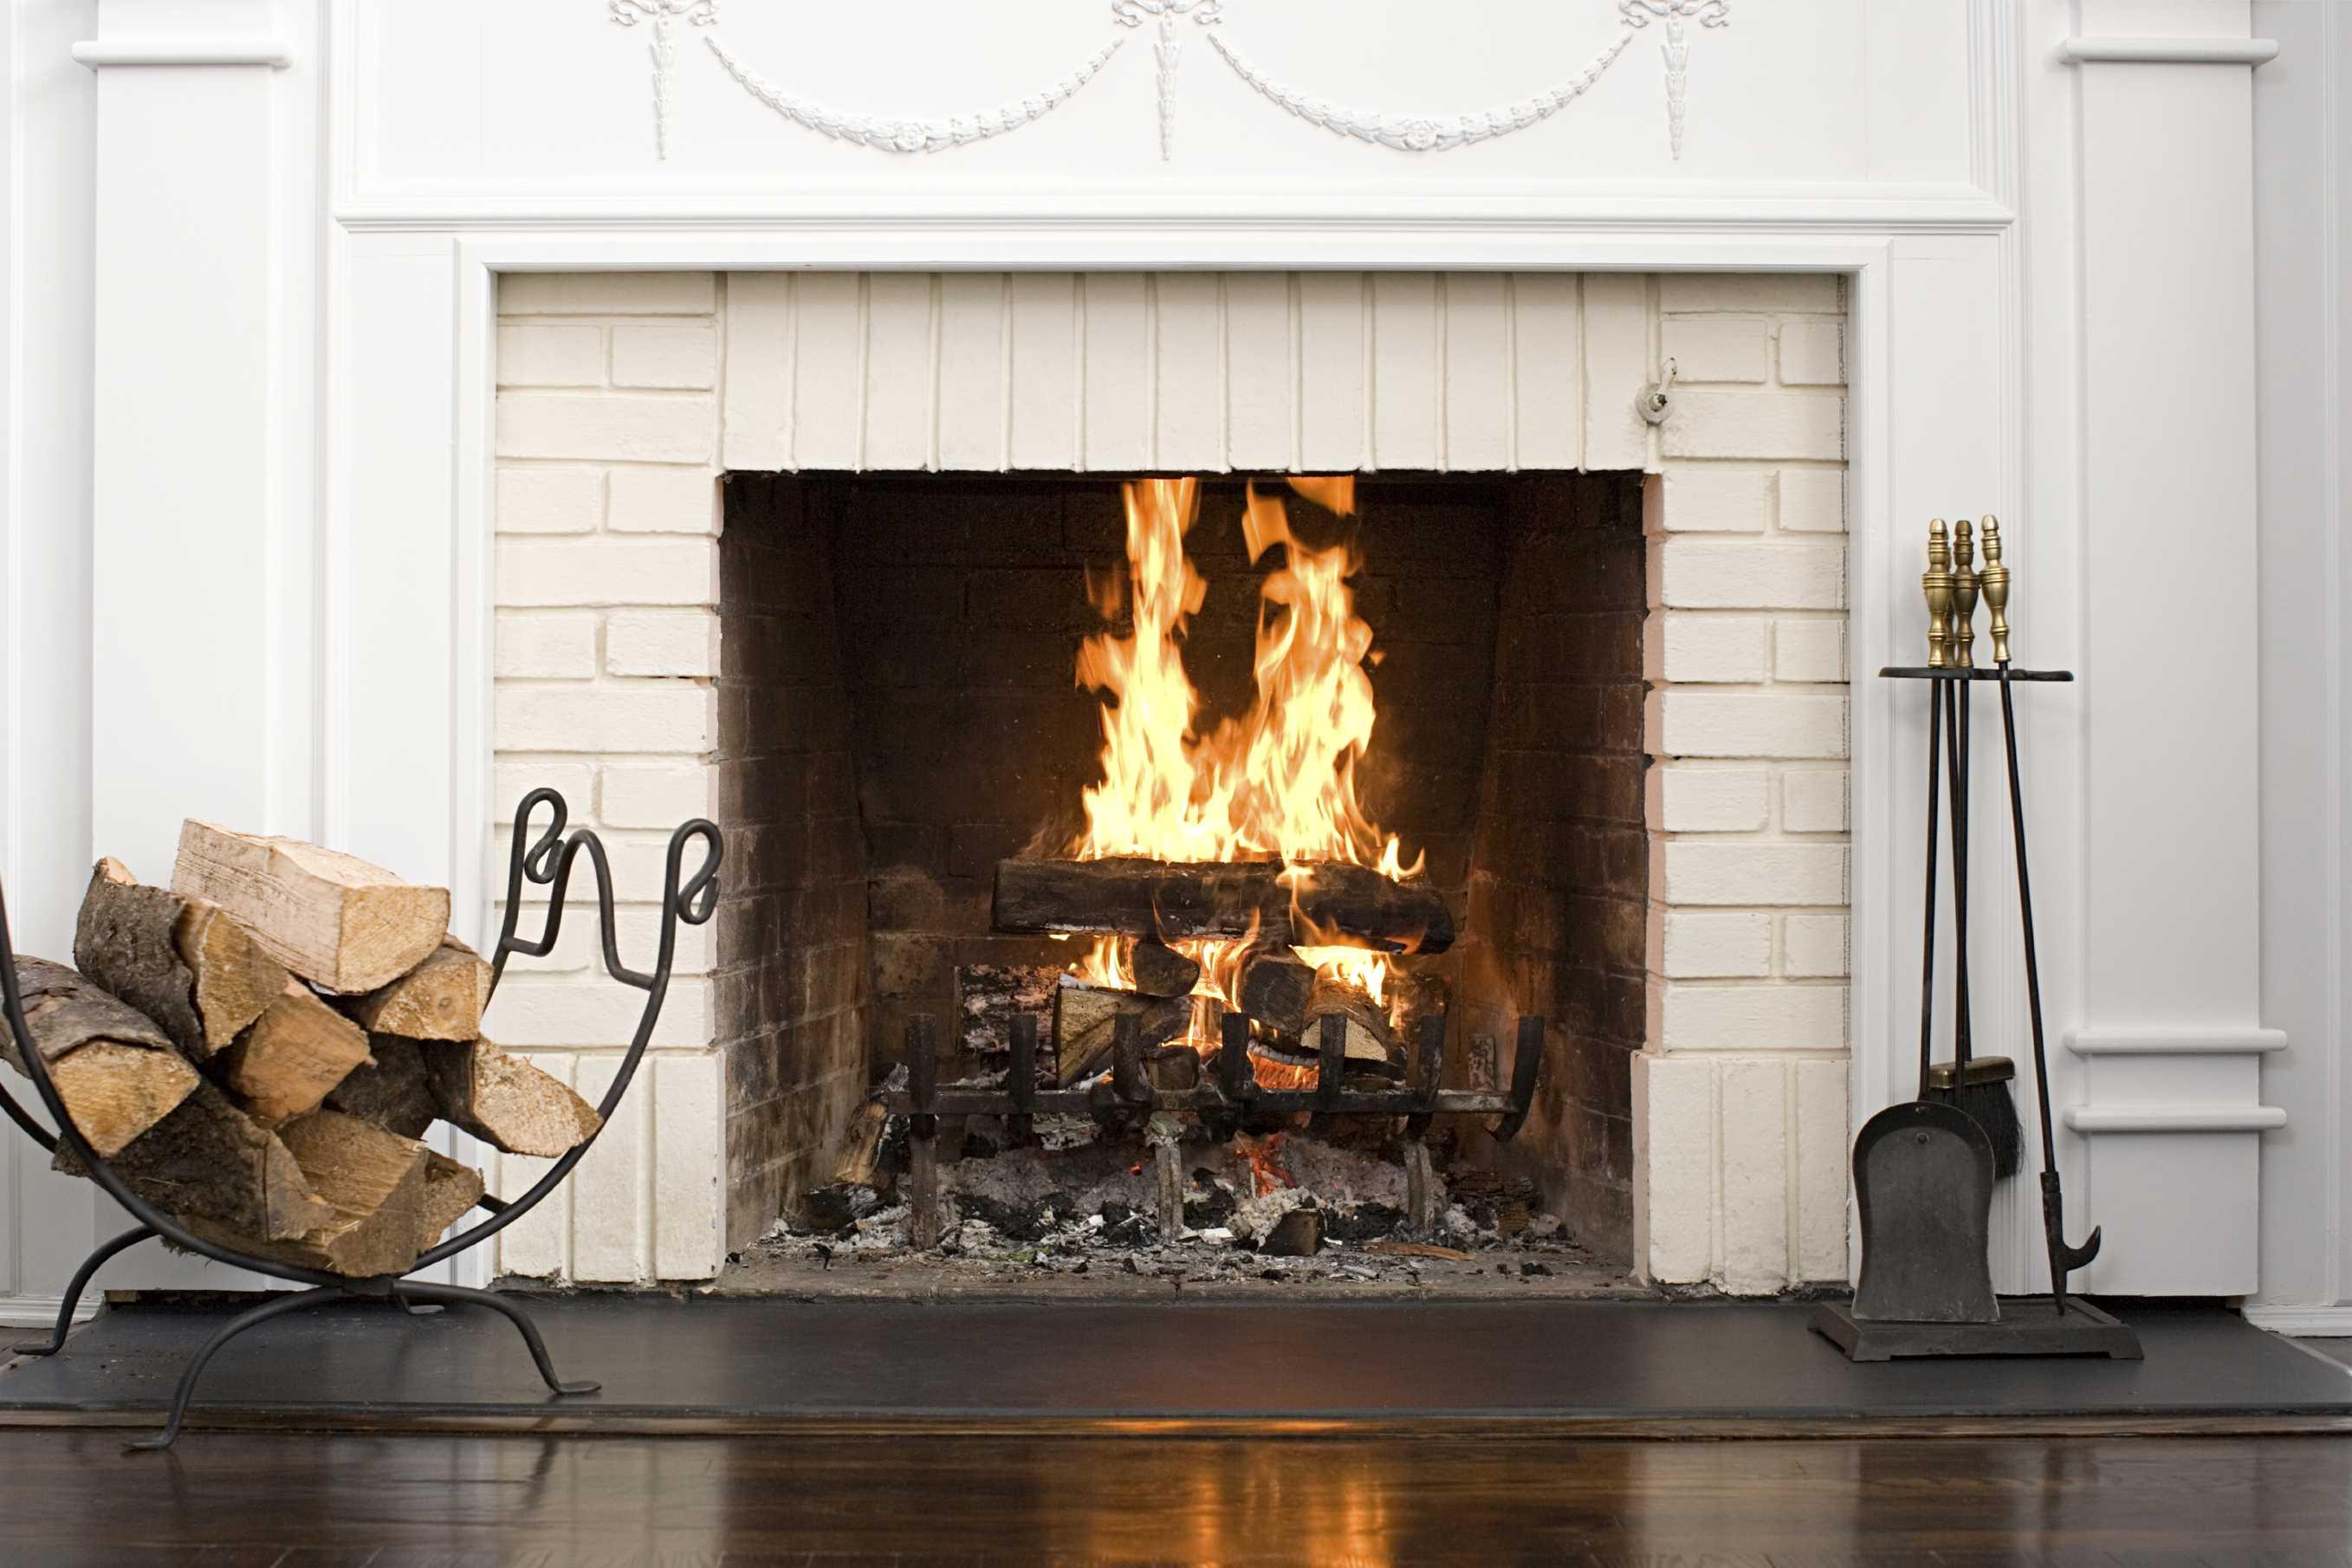 Chimney Fire Safety Week 2015